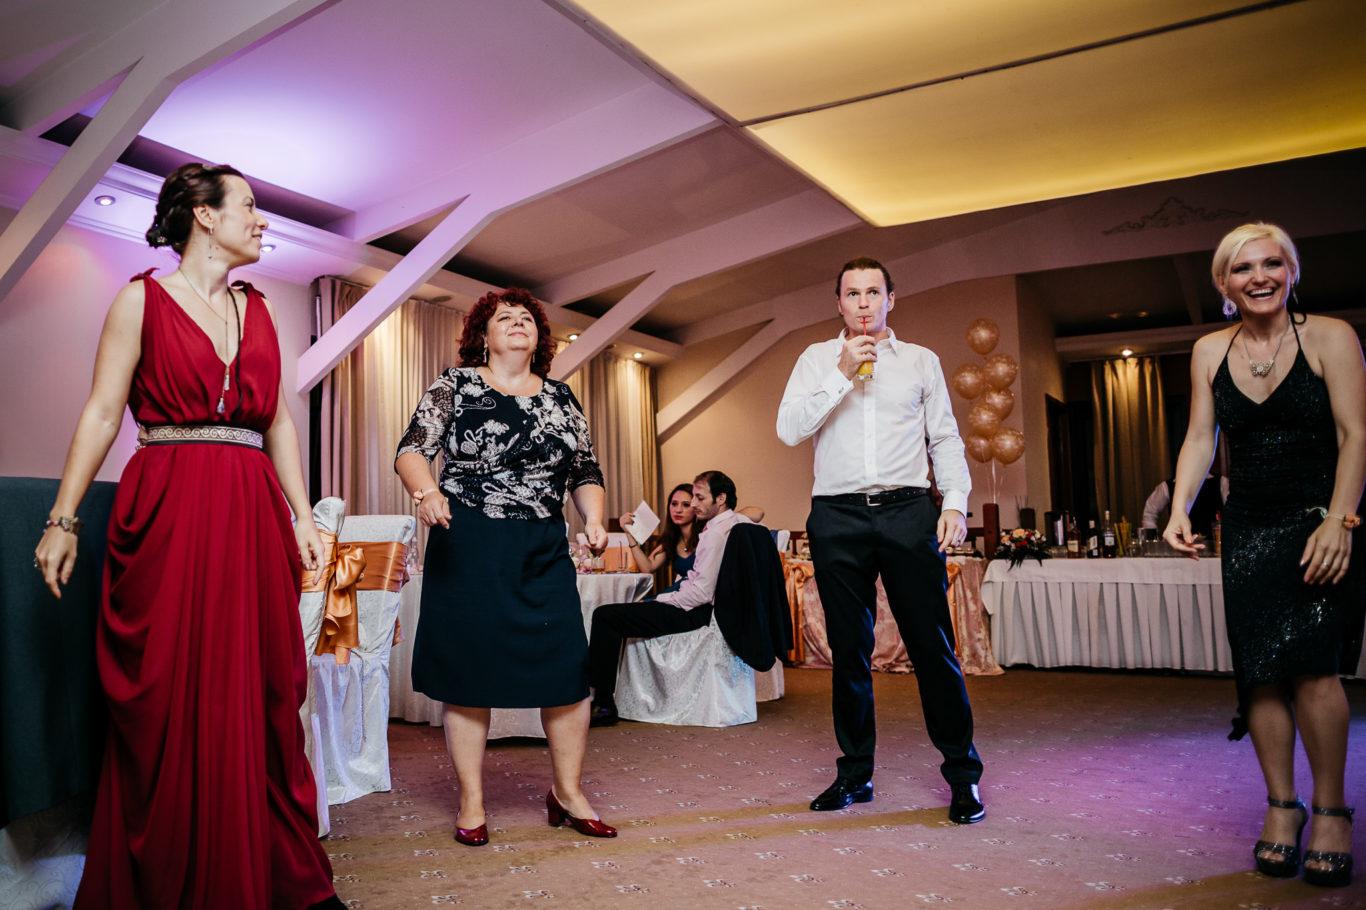 0709-fotografie-nunta-bucuresti-dana-radu-fotograf-ciprian-dumitrescu-dc1_4354